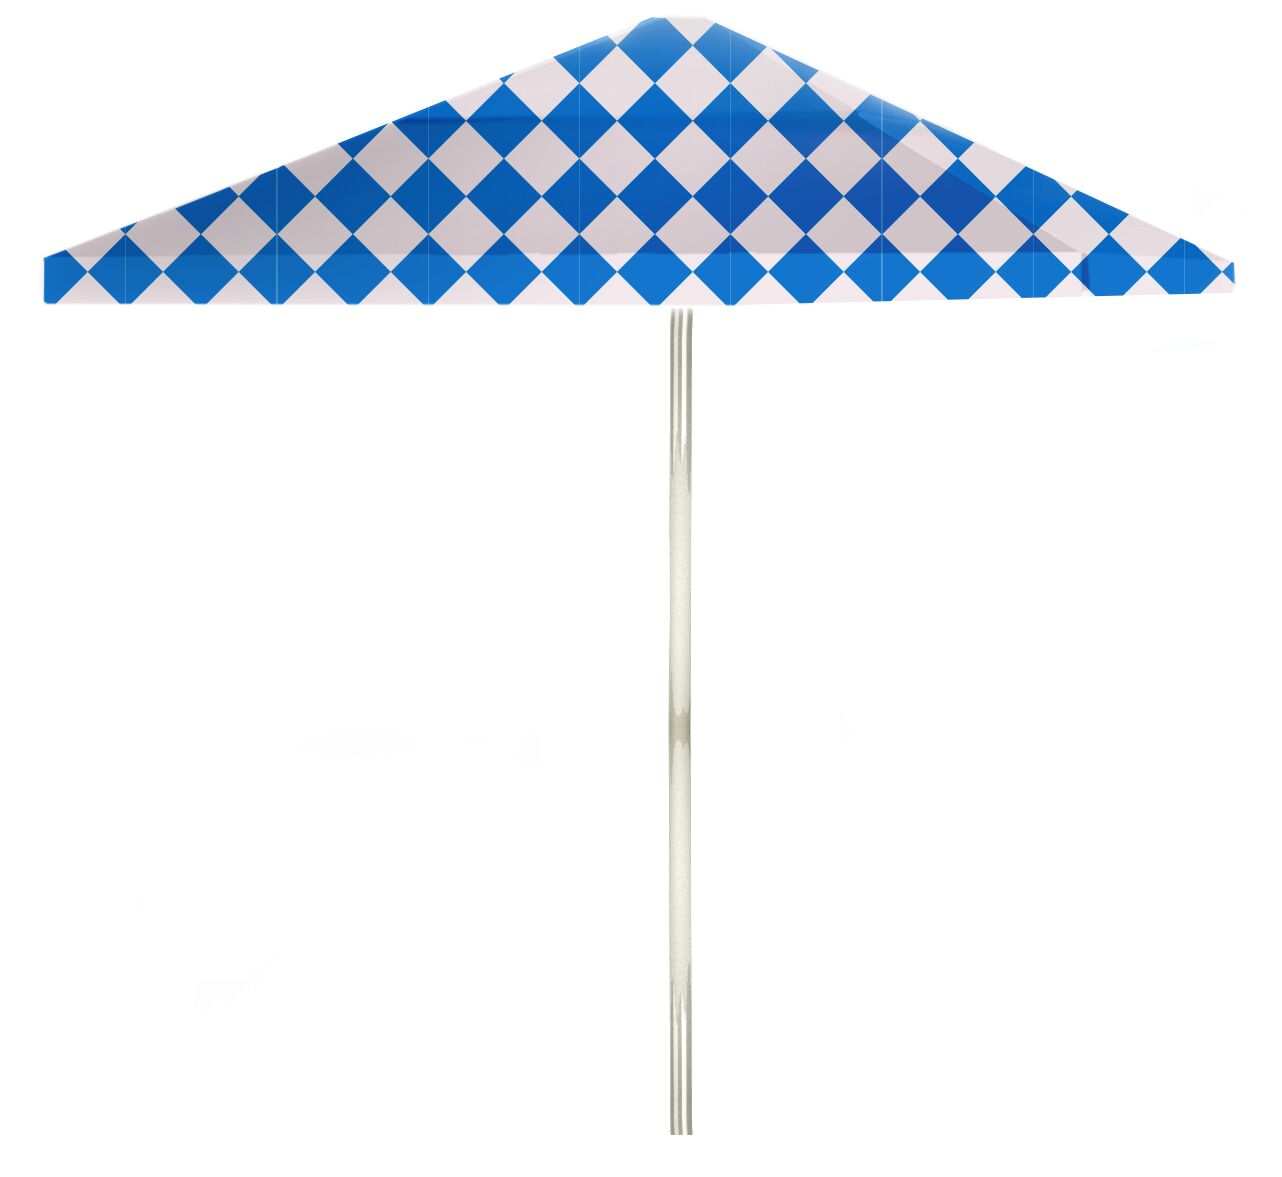 6' Square Market Umbrella Color: Royal Blue/White